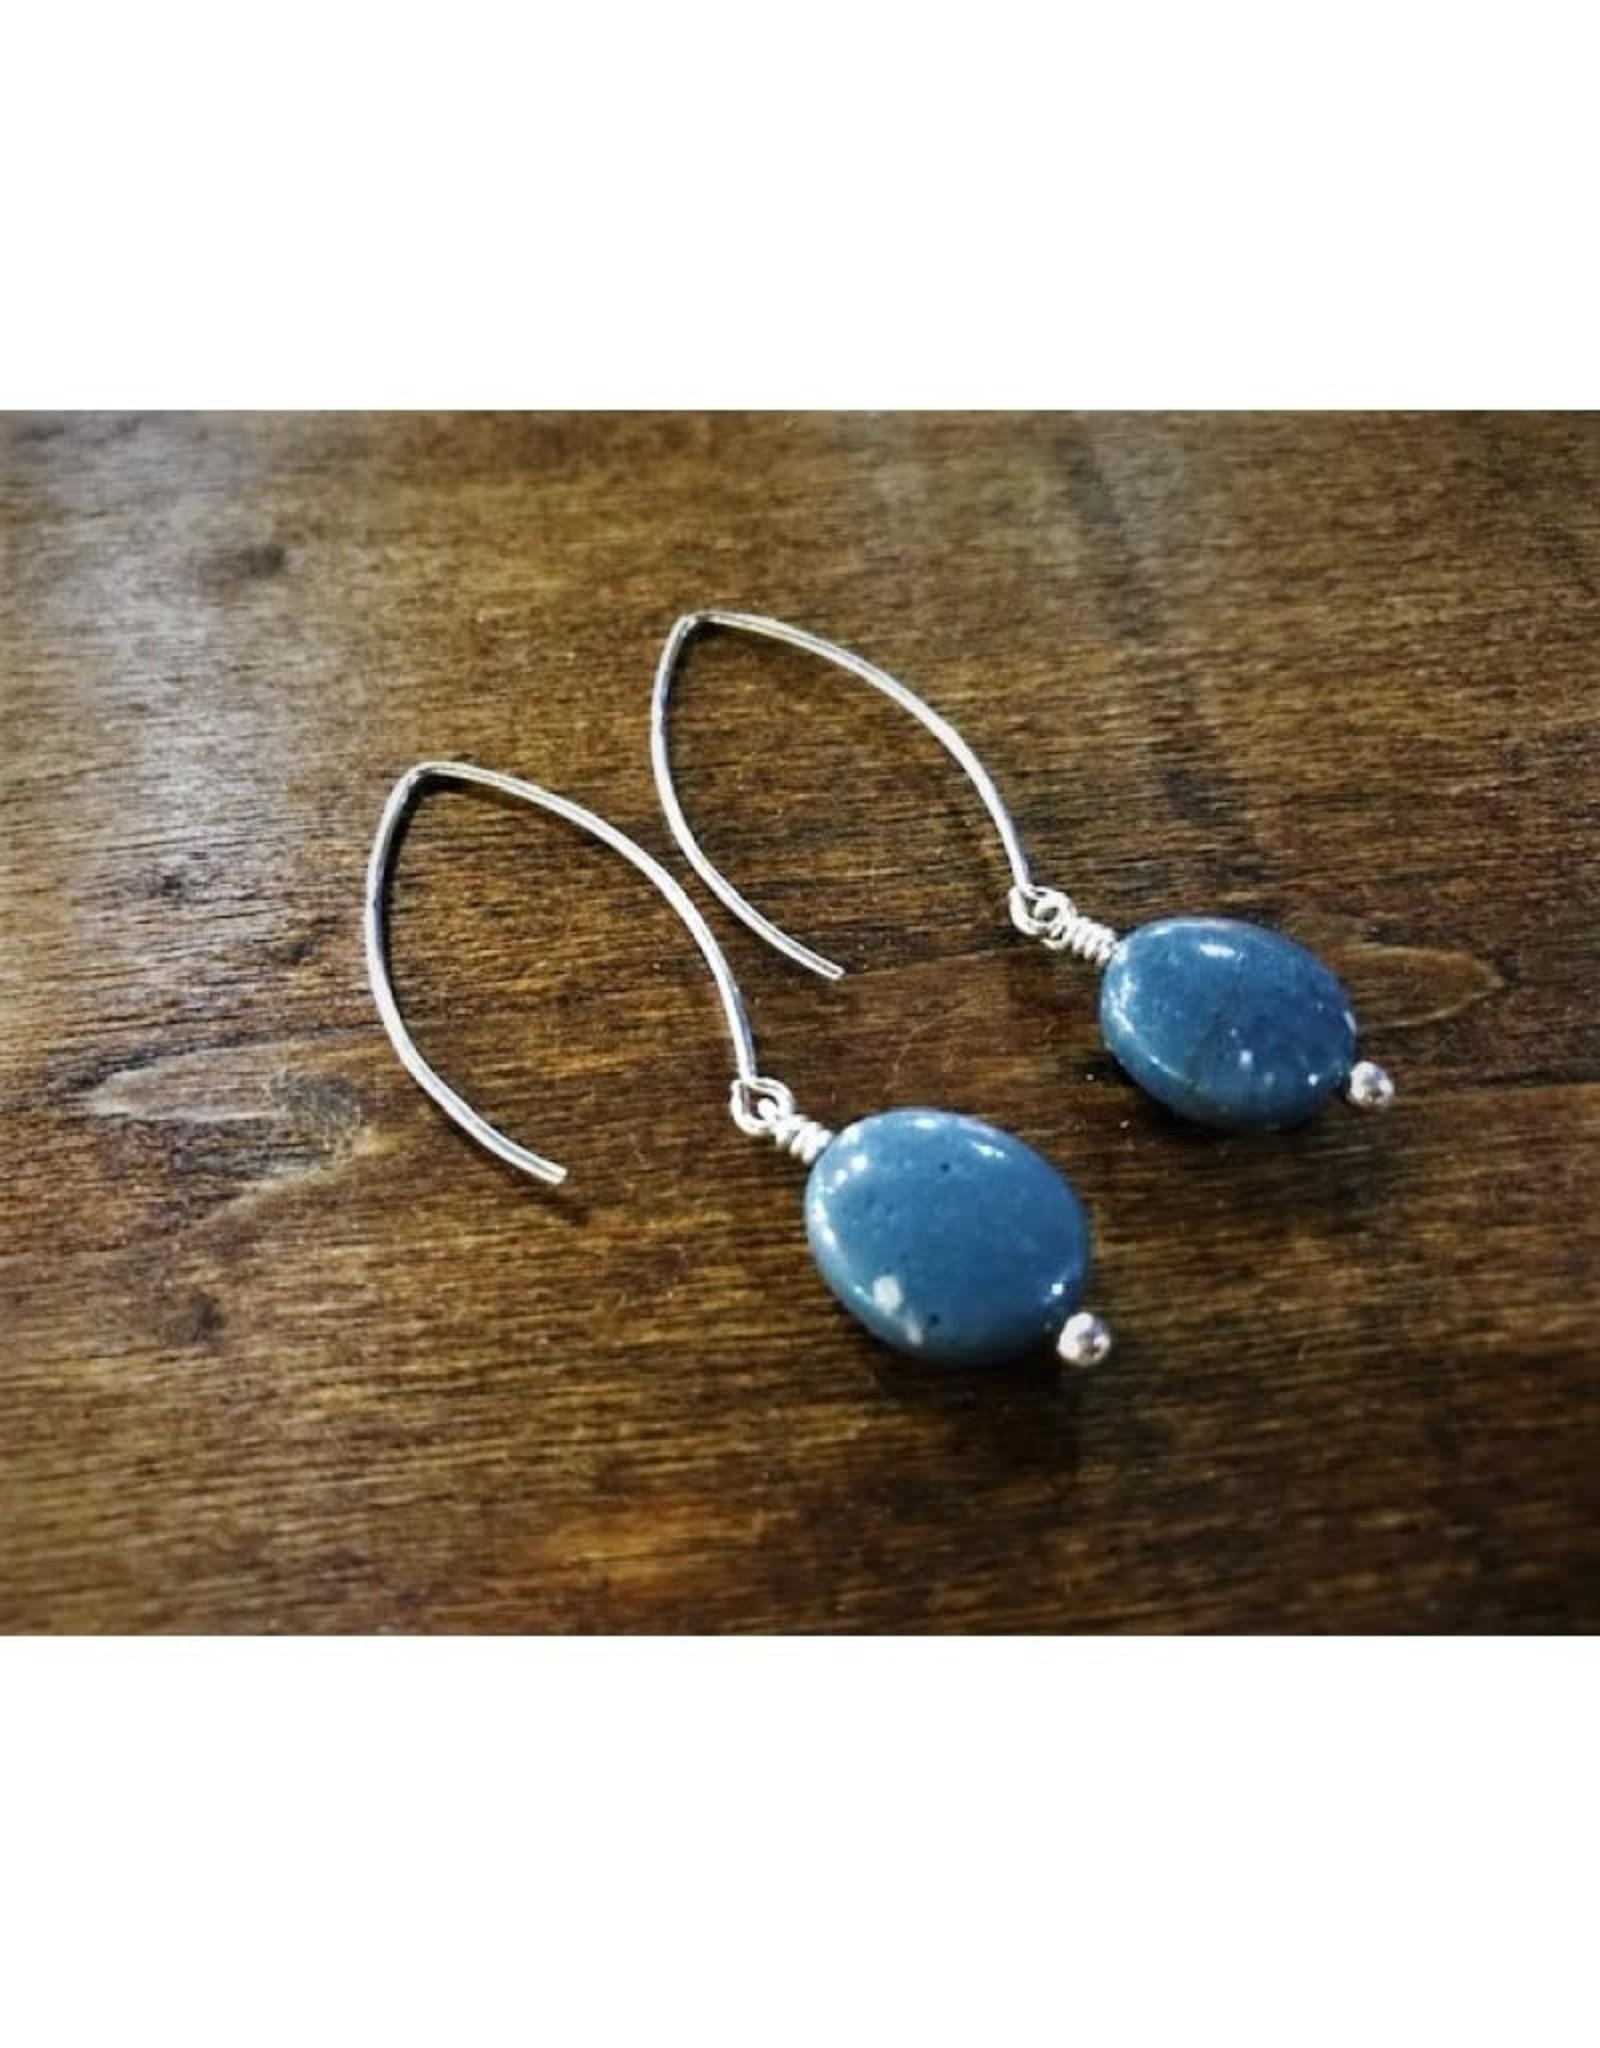 Dangle Earrings - Leland Blue Oval